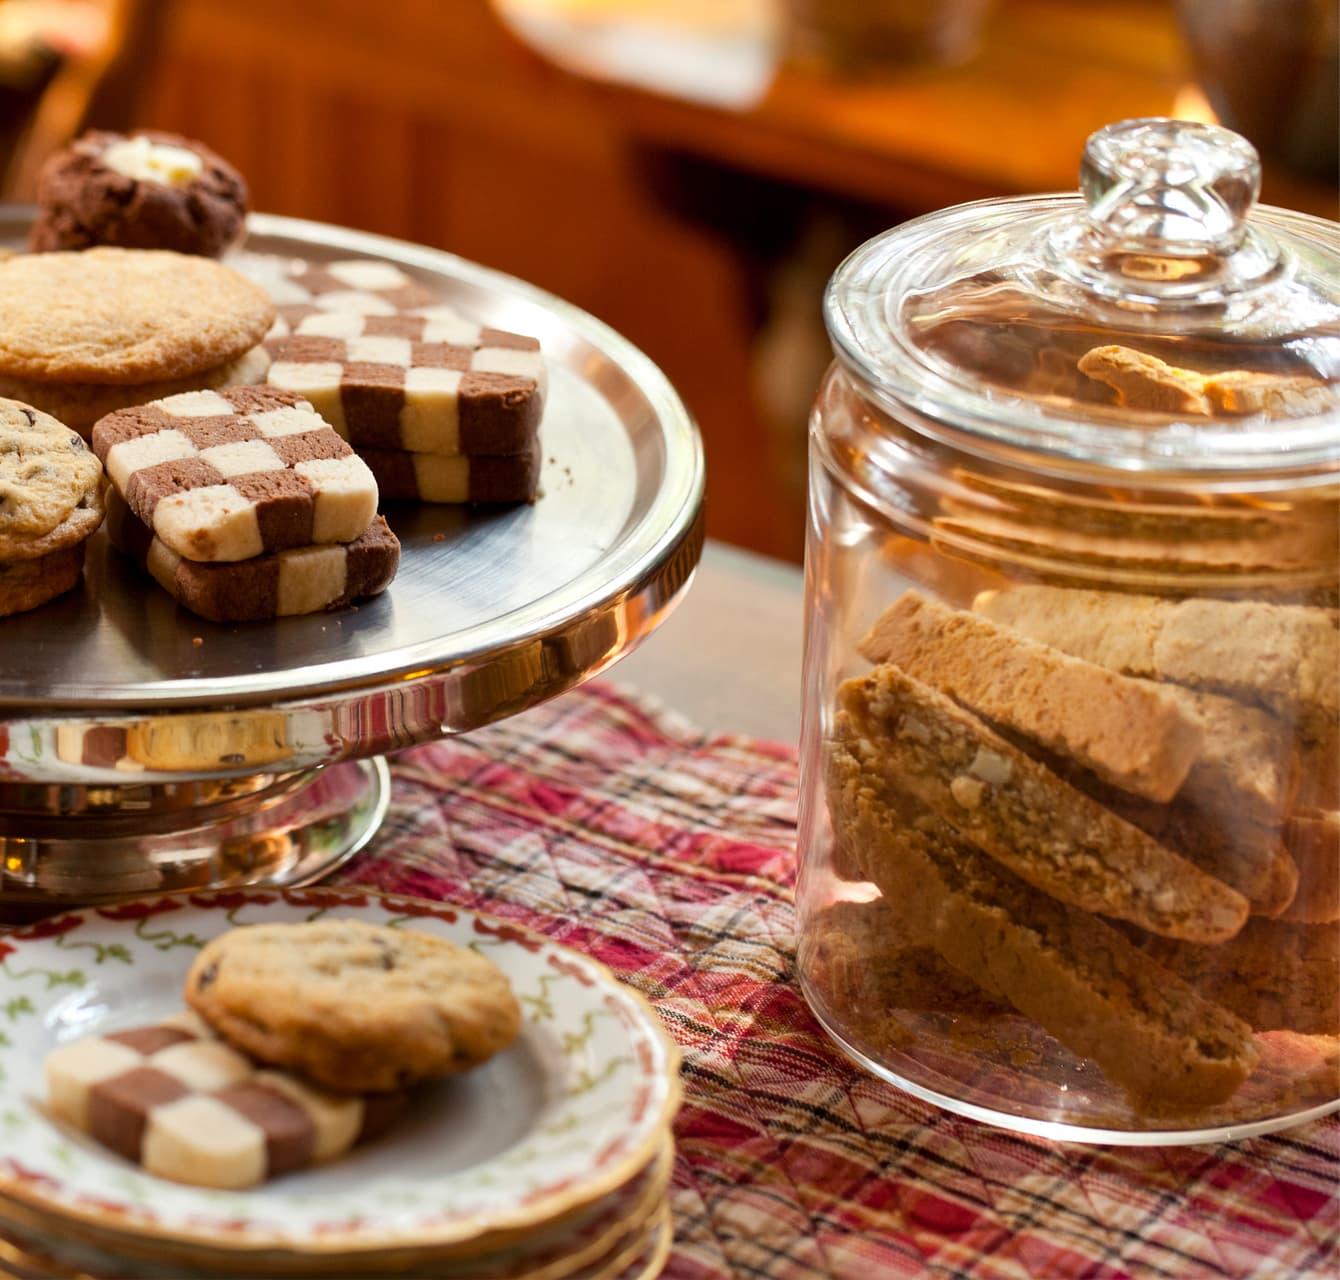 assortment of baked goods checkerboard cookies